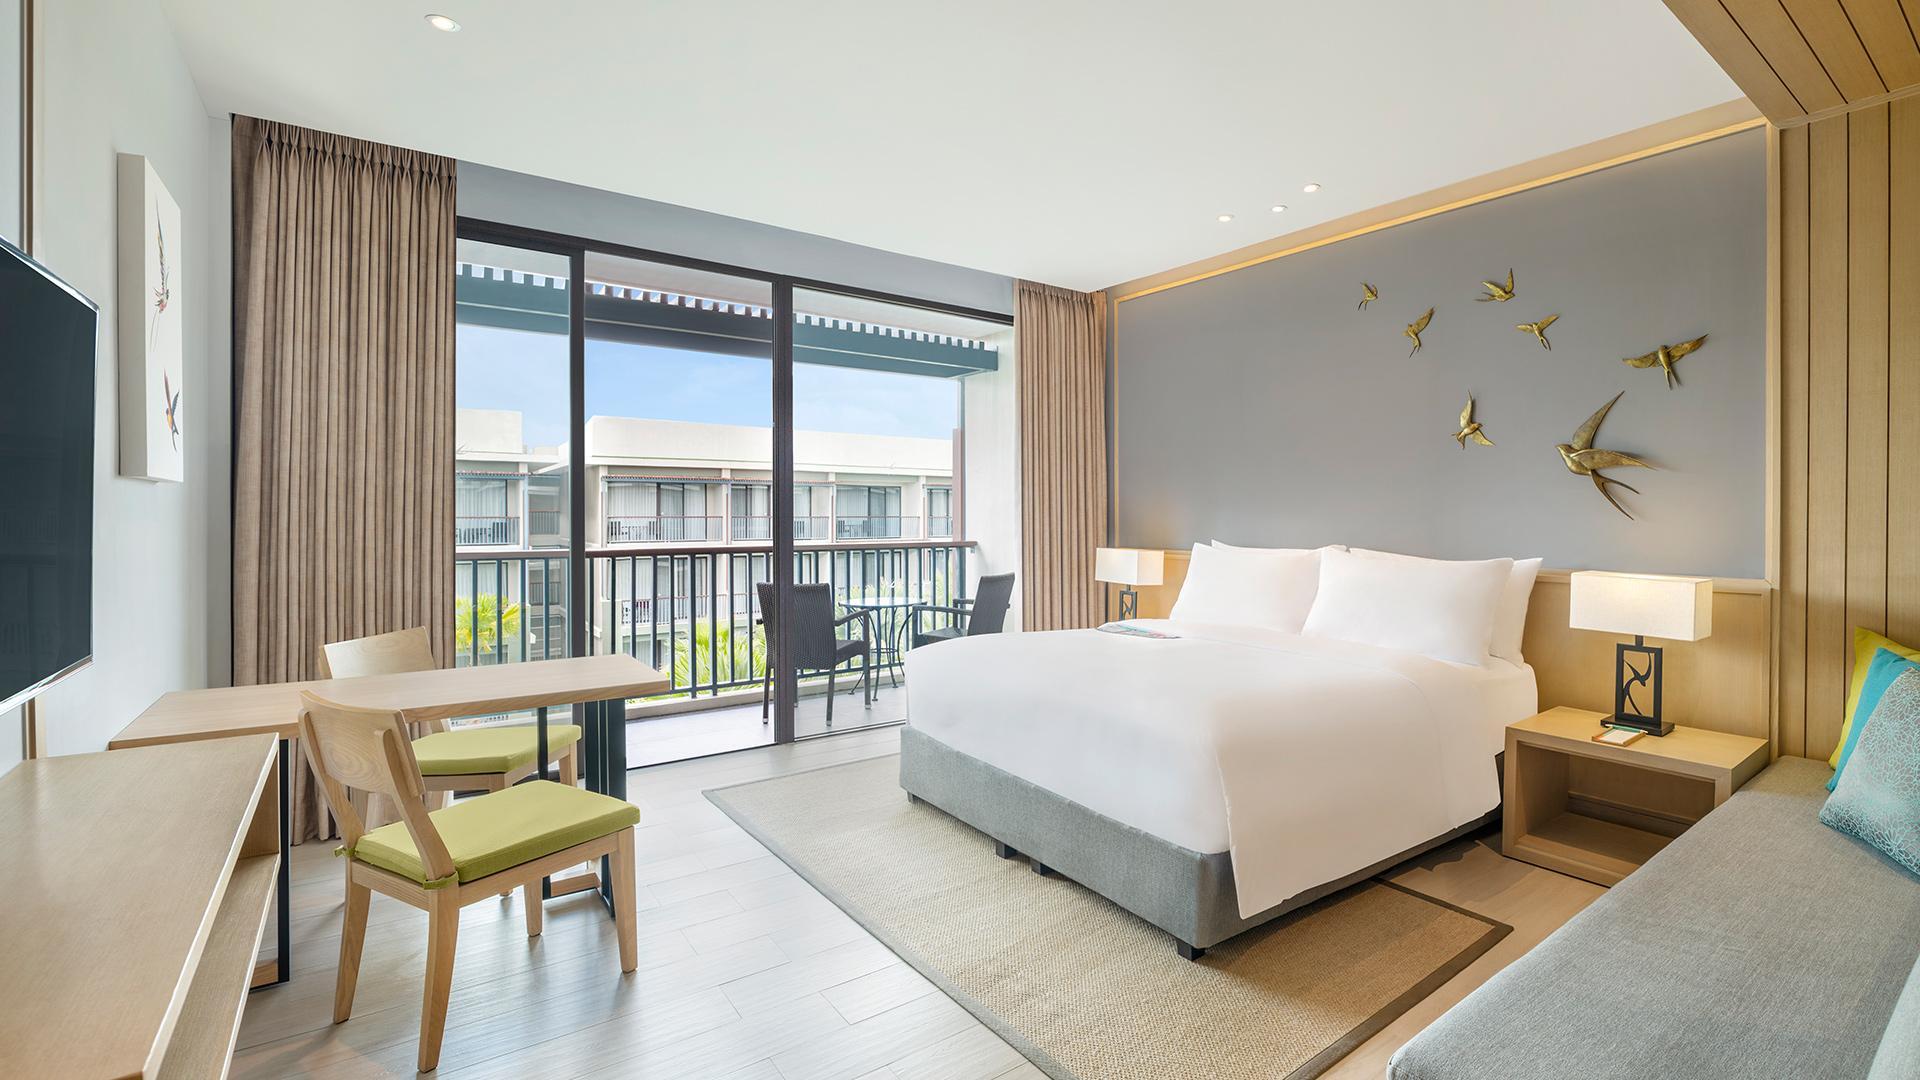 Superior Pool View Room image 1 at Le Méridien Khao Lak Resort & Spa by Amphoe Takua Pa, Chang Wat Phang-nga, Thailand